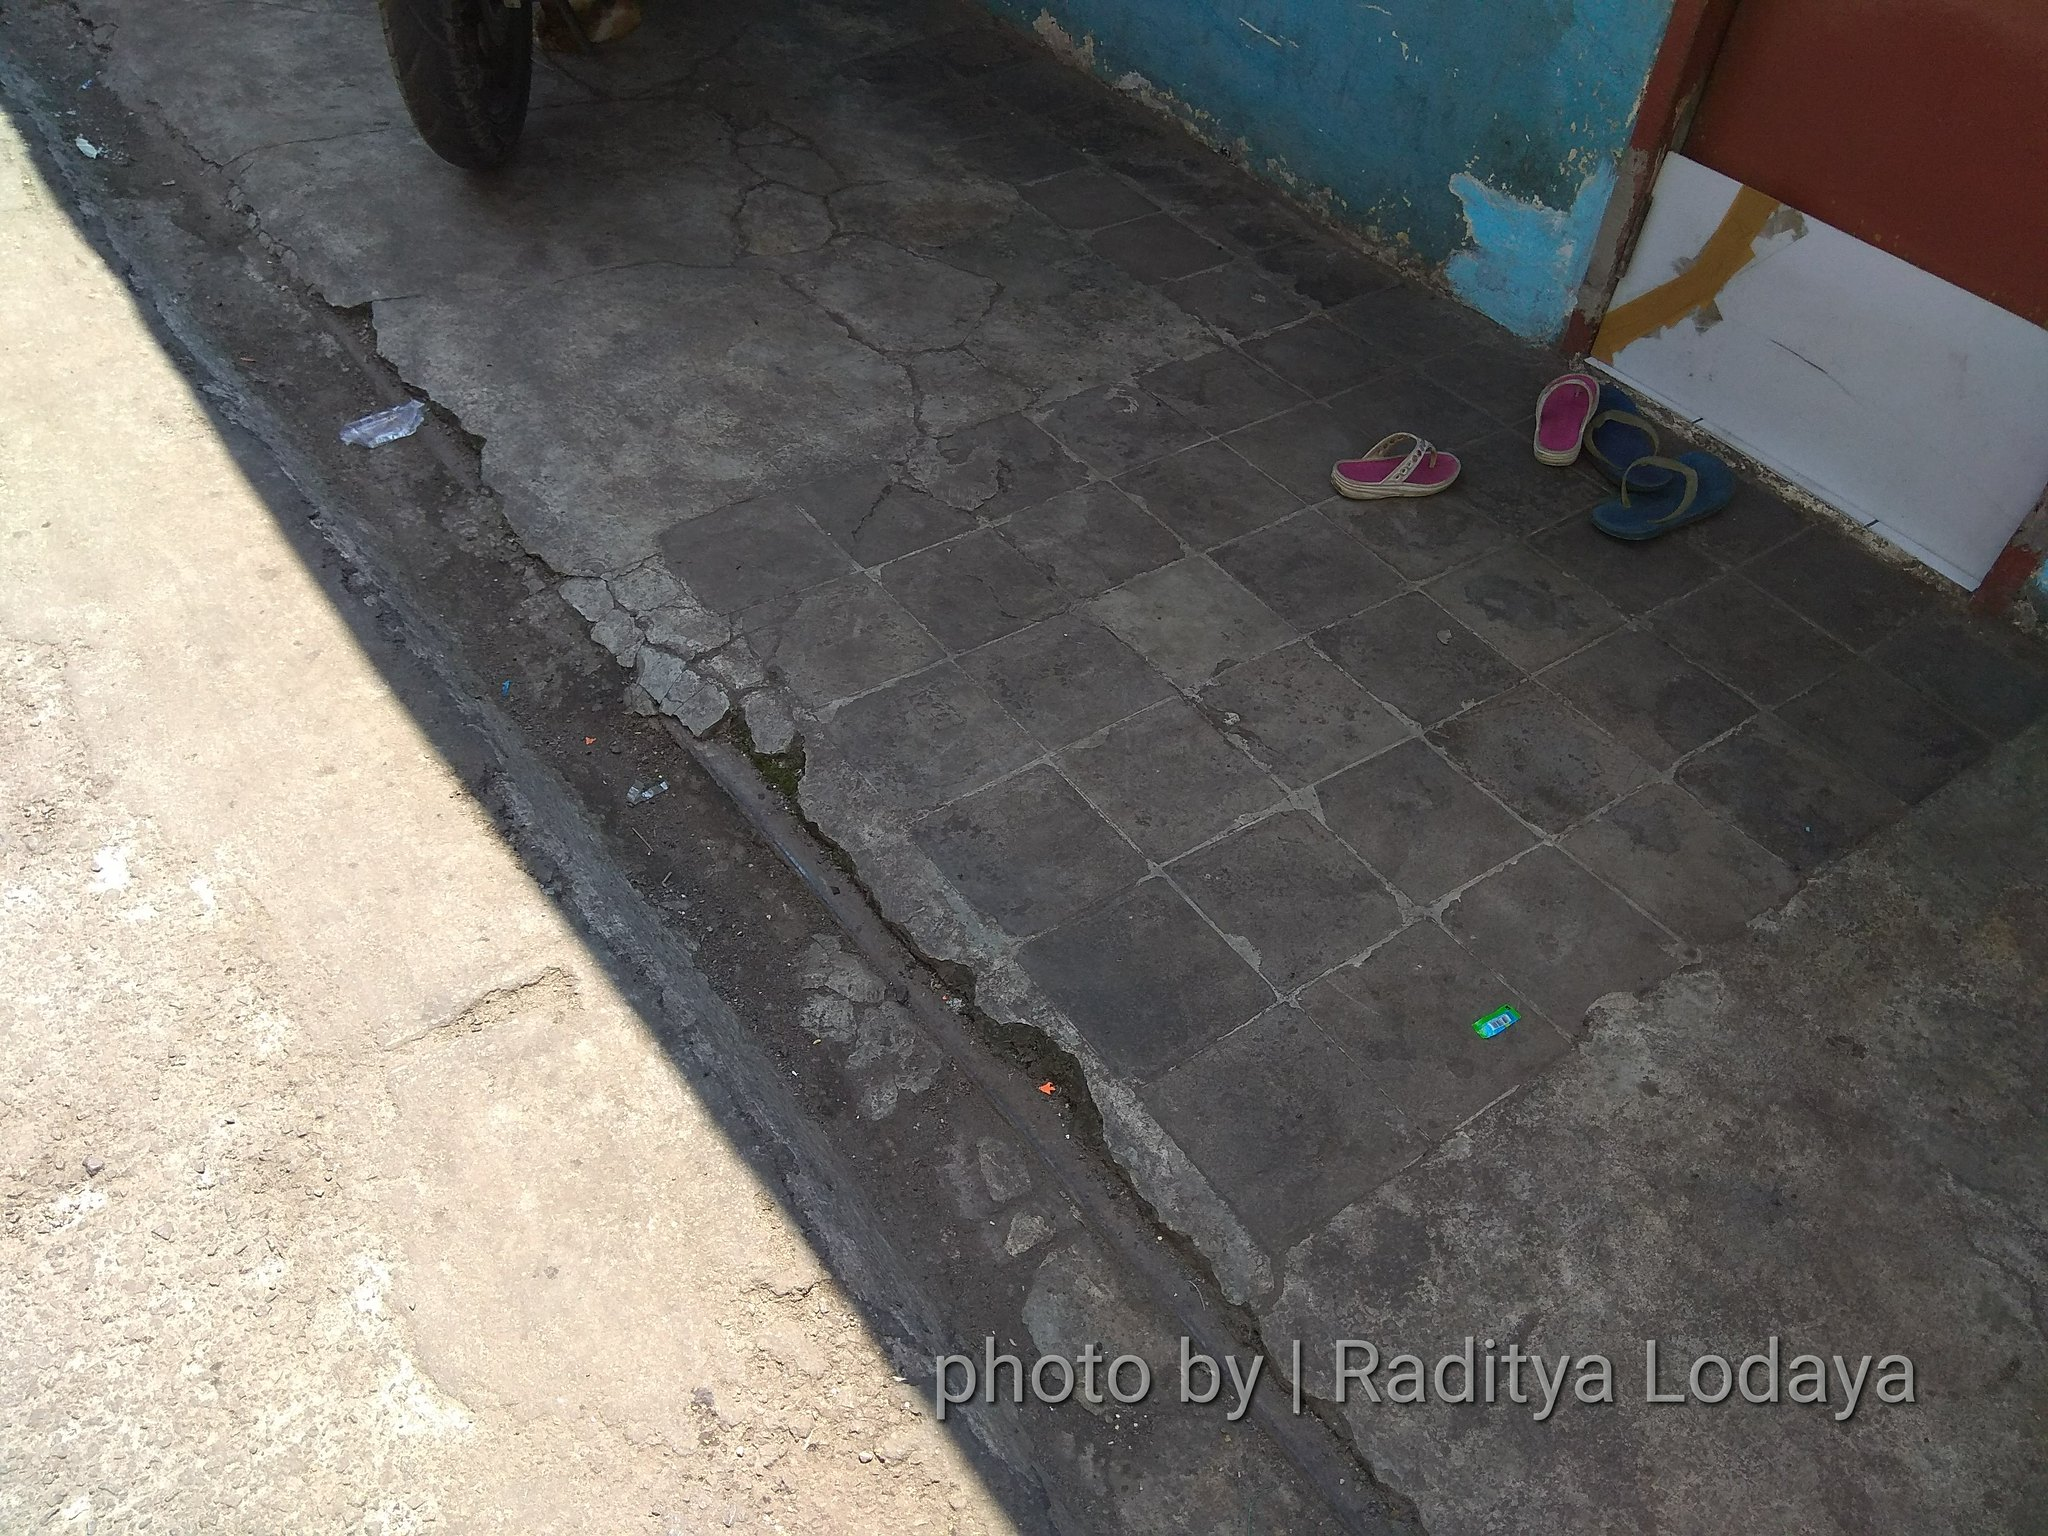 Foto Jalur Rel Mati Bandung (Kiaracondong Karees) 33 - Nyeberang Jalan Malabar masuk Malabar 1 mulai terlihat lagi ada bekas rel